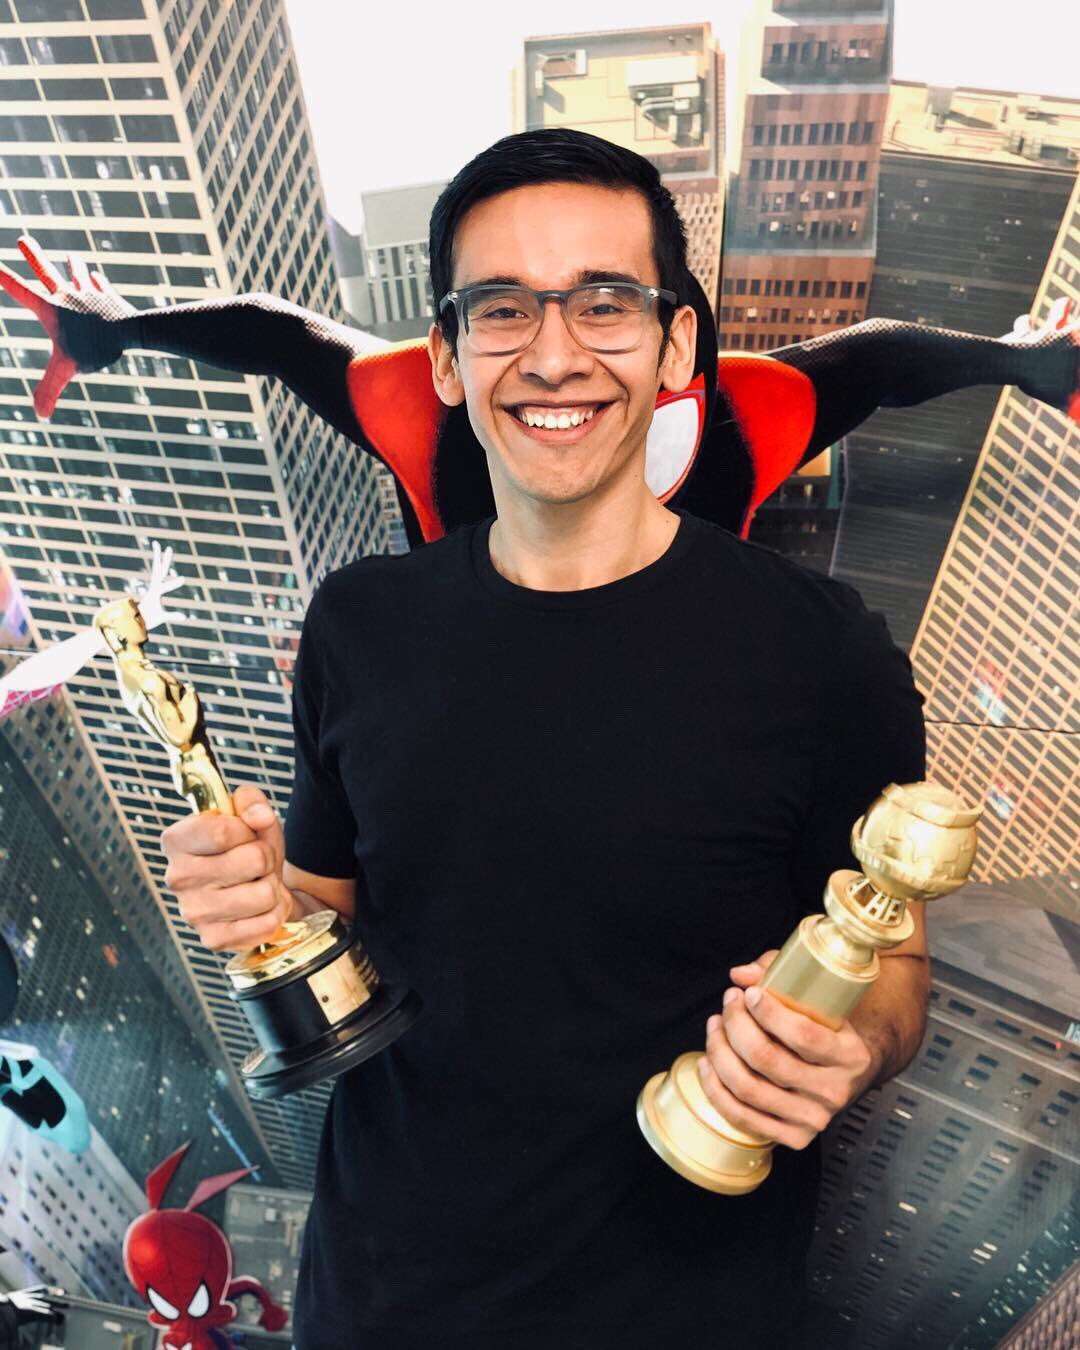 Silao recibe a joven ganador del Oscar Oscar, Cruz Antonio Contreras Mastache